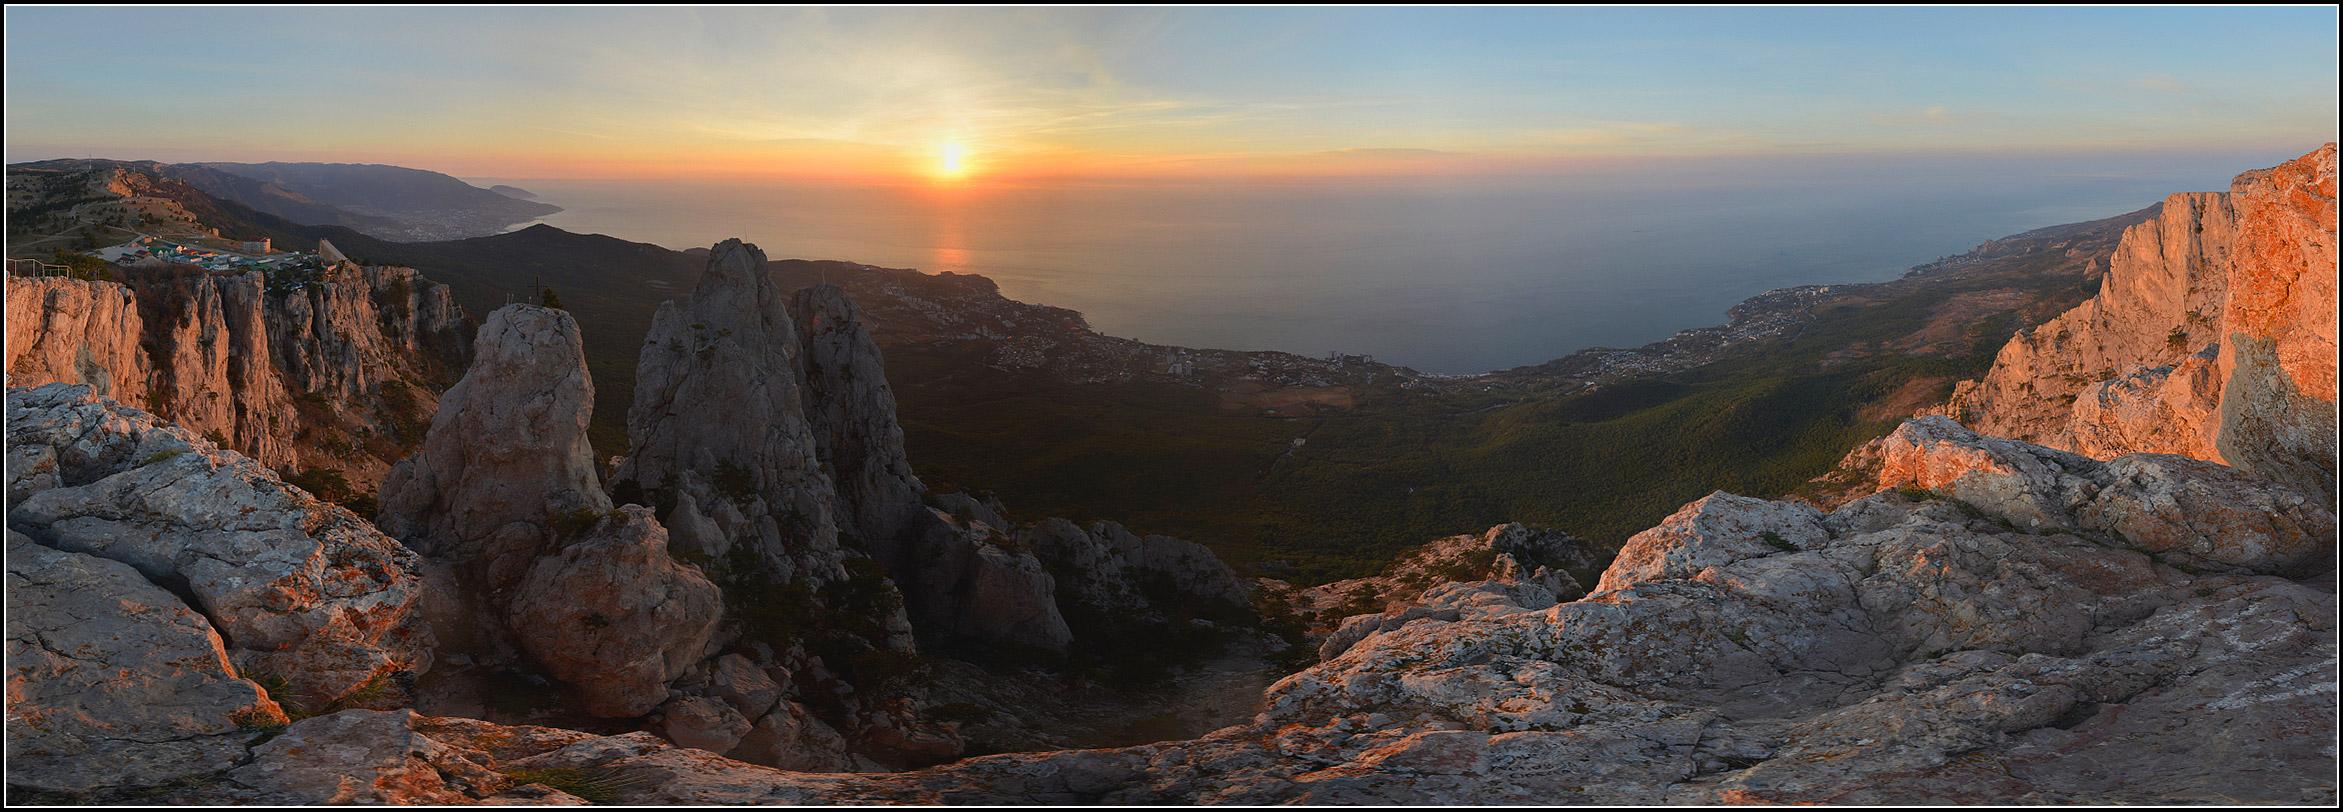 Крым, утро, солнце, море, г.Ай-Петри